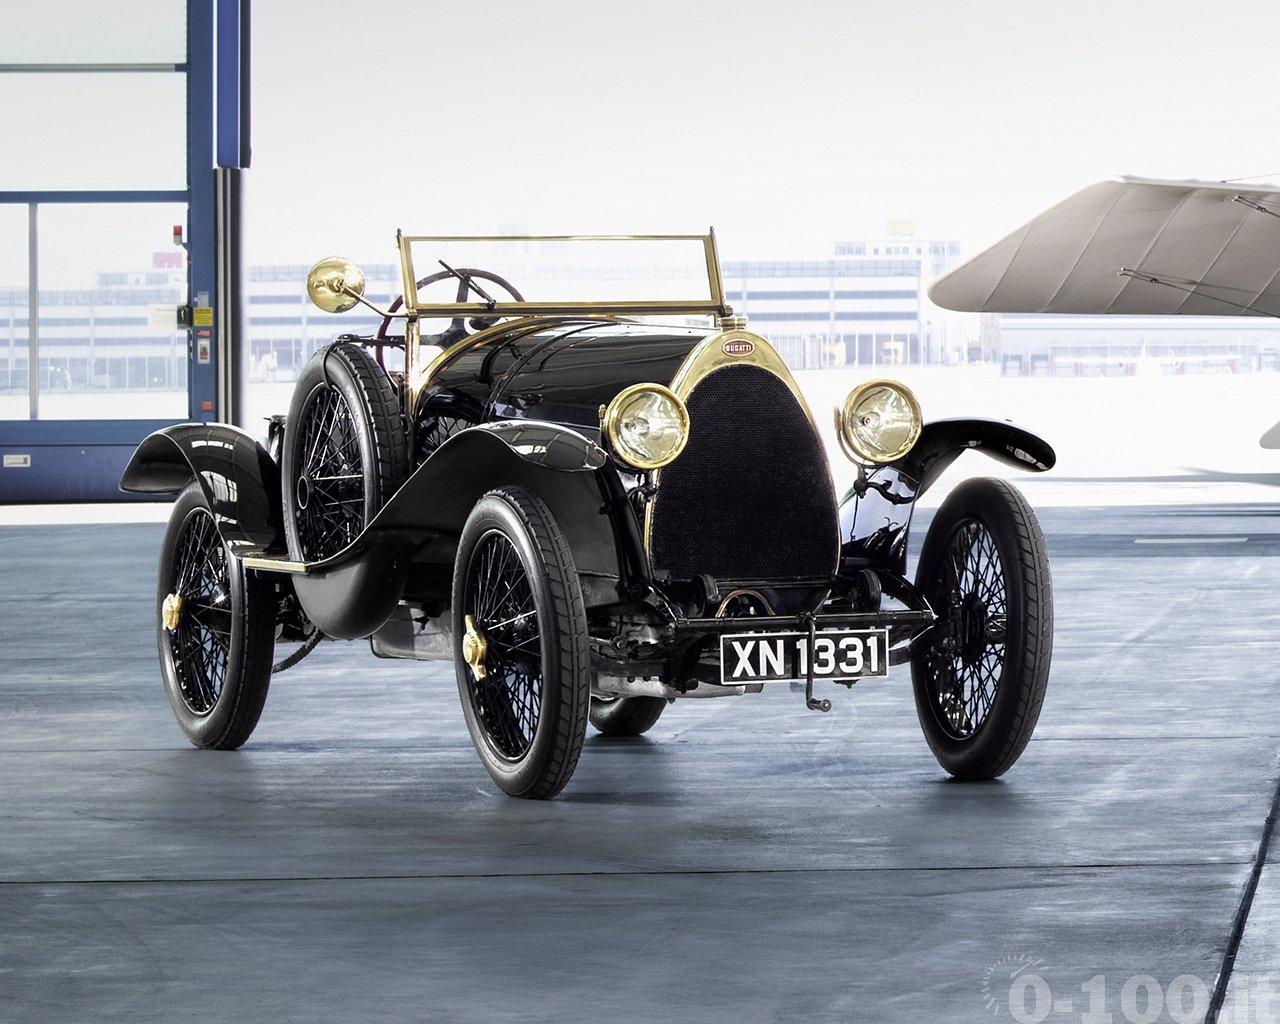 beijing-2014-bugatti-veyron-serie-speciale-les-legendes-de-bugatti-veyron-16-4-grand-sport-vitesse-black-bess_9